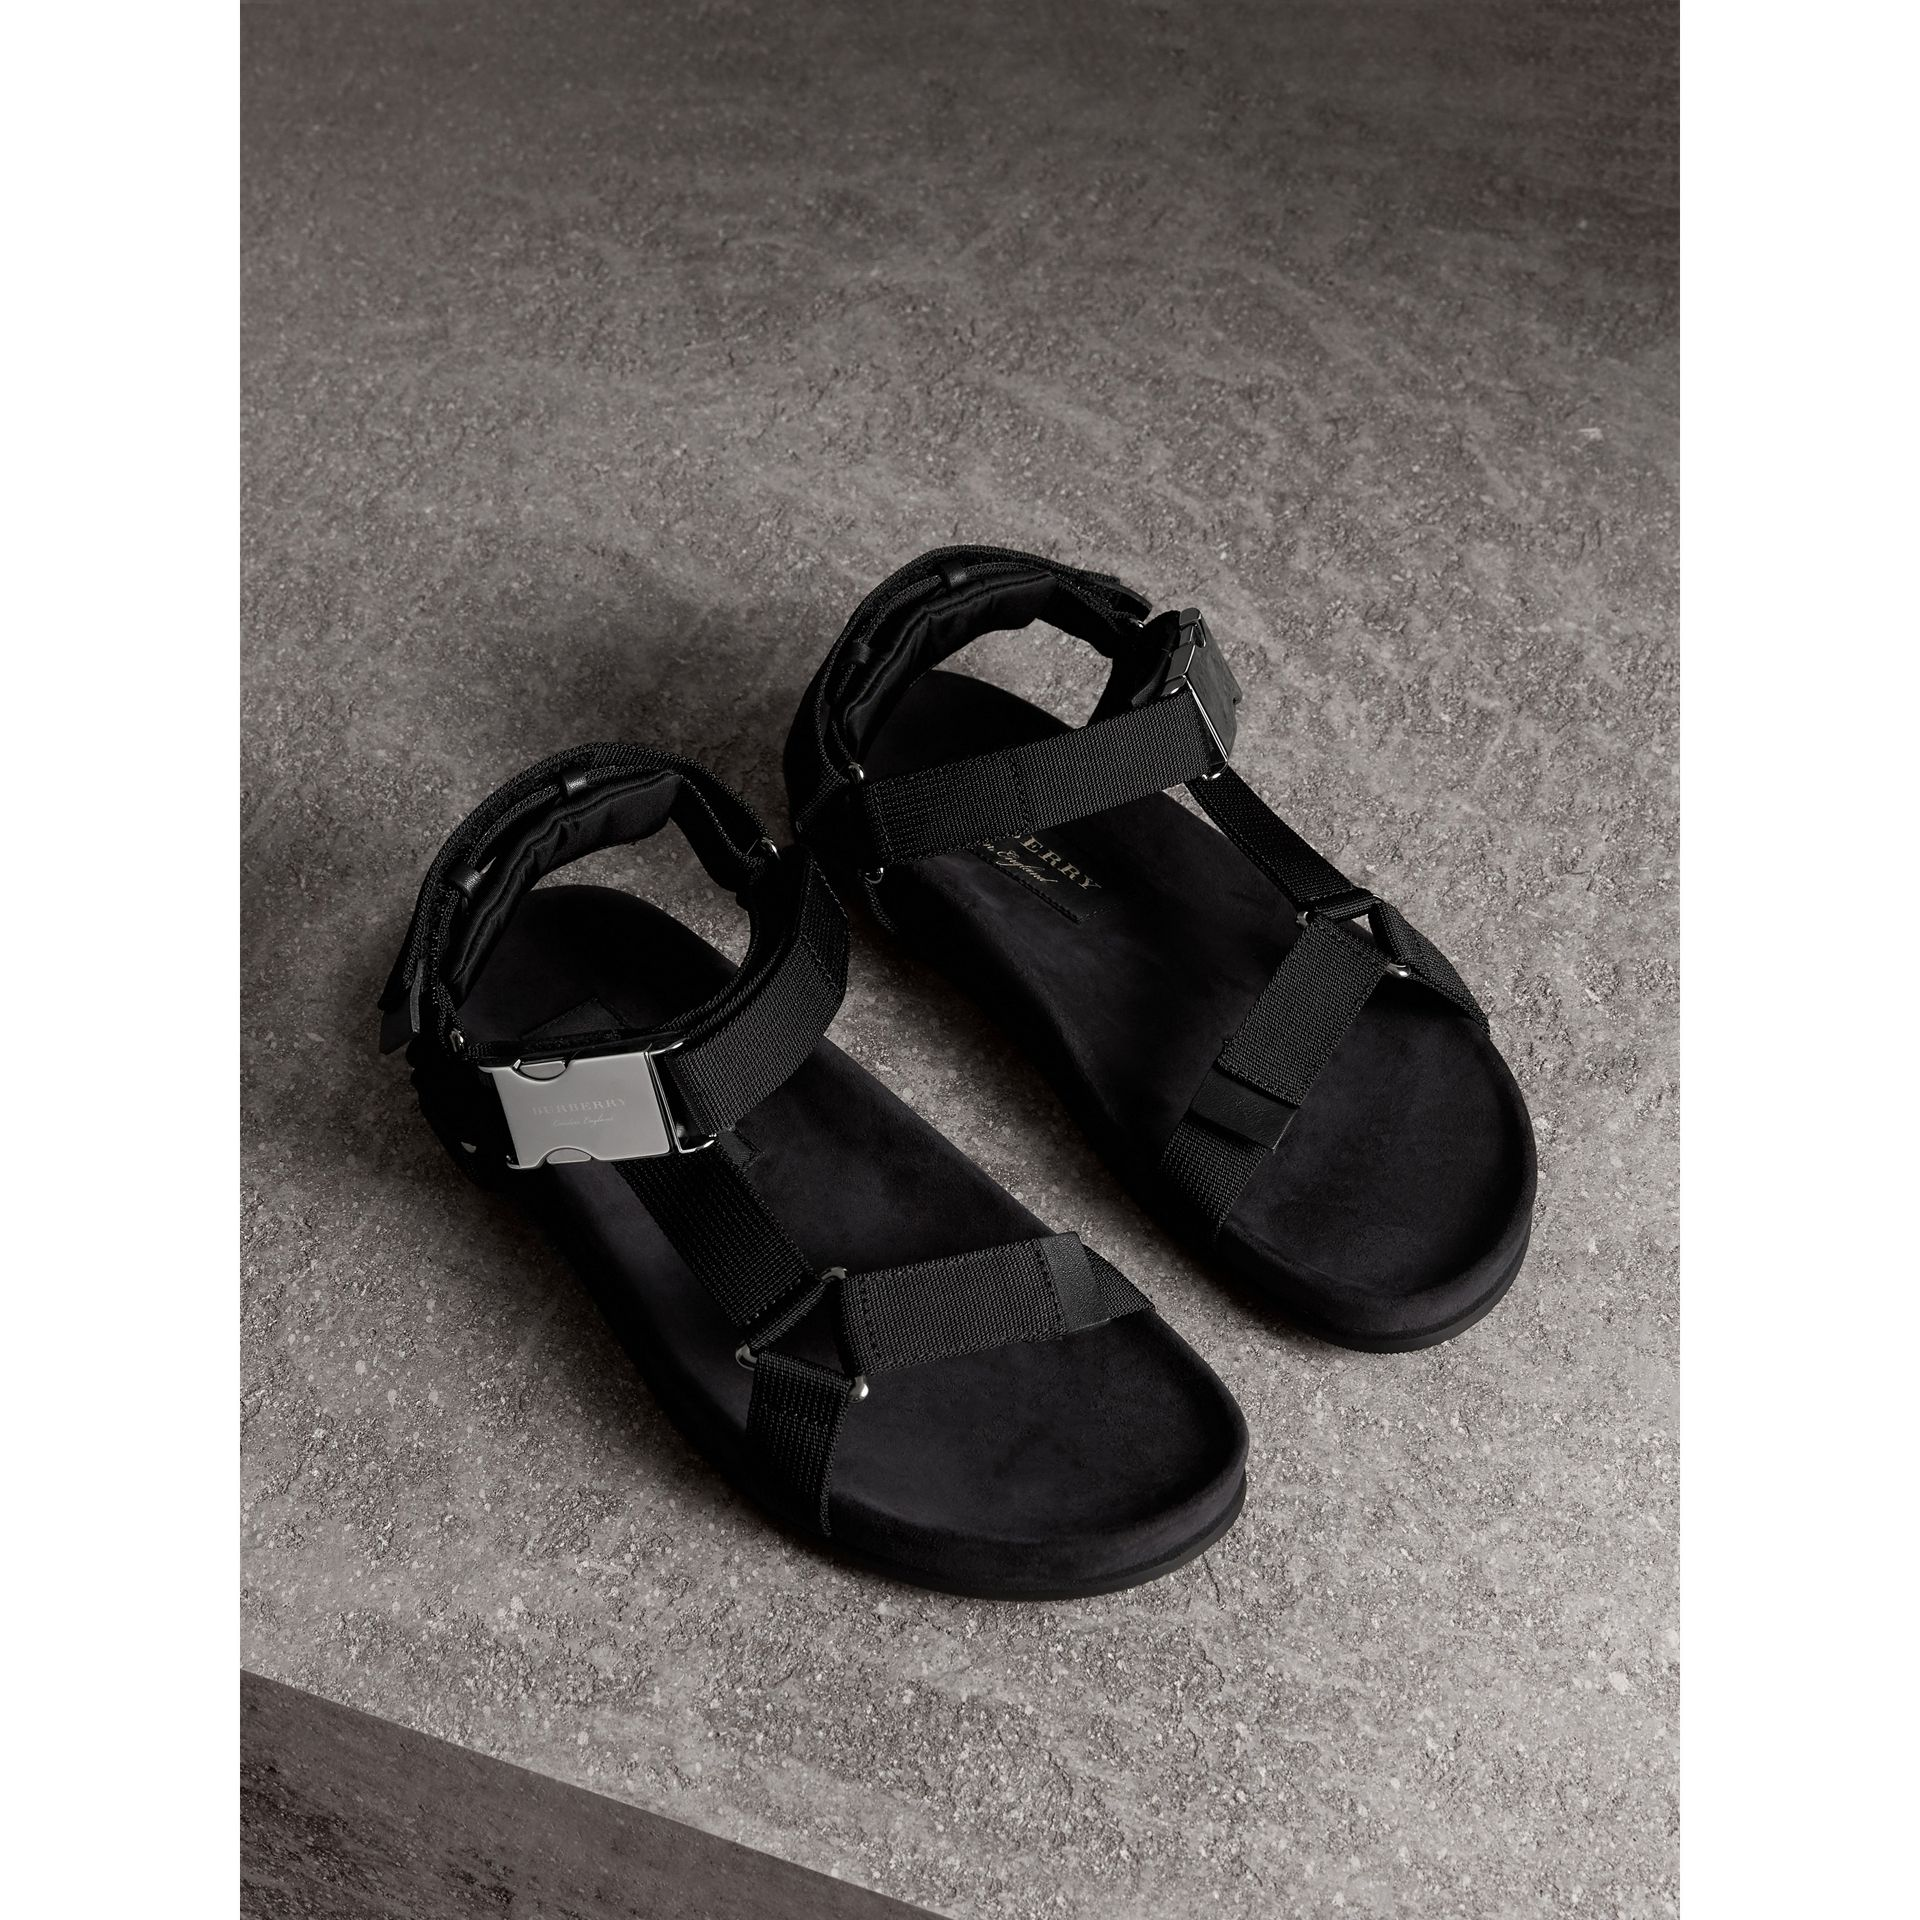 Three-point Strap Ripstop Sandals in Black - Men | Burberry Australia - gallery image 1